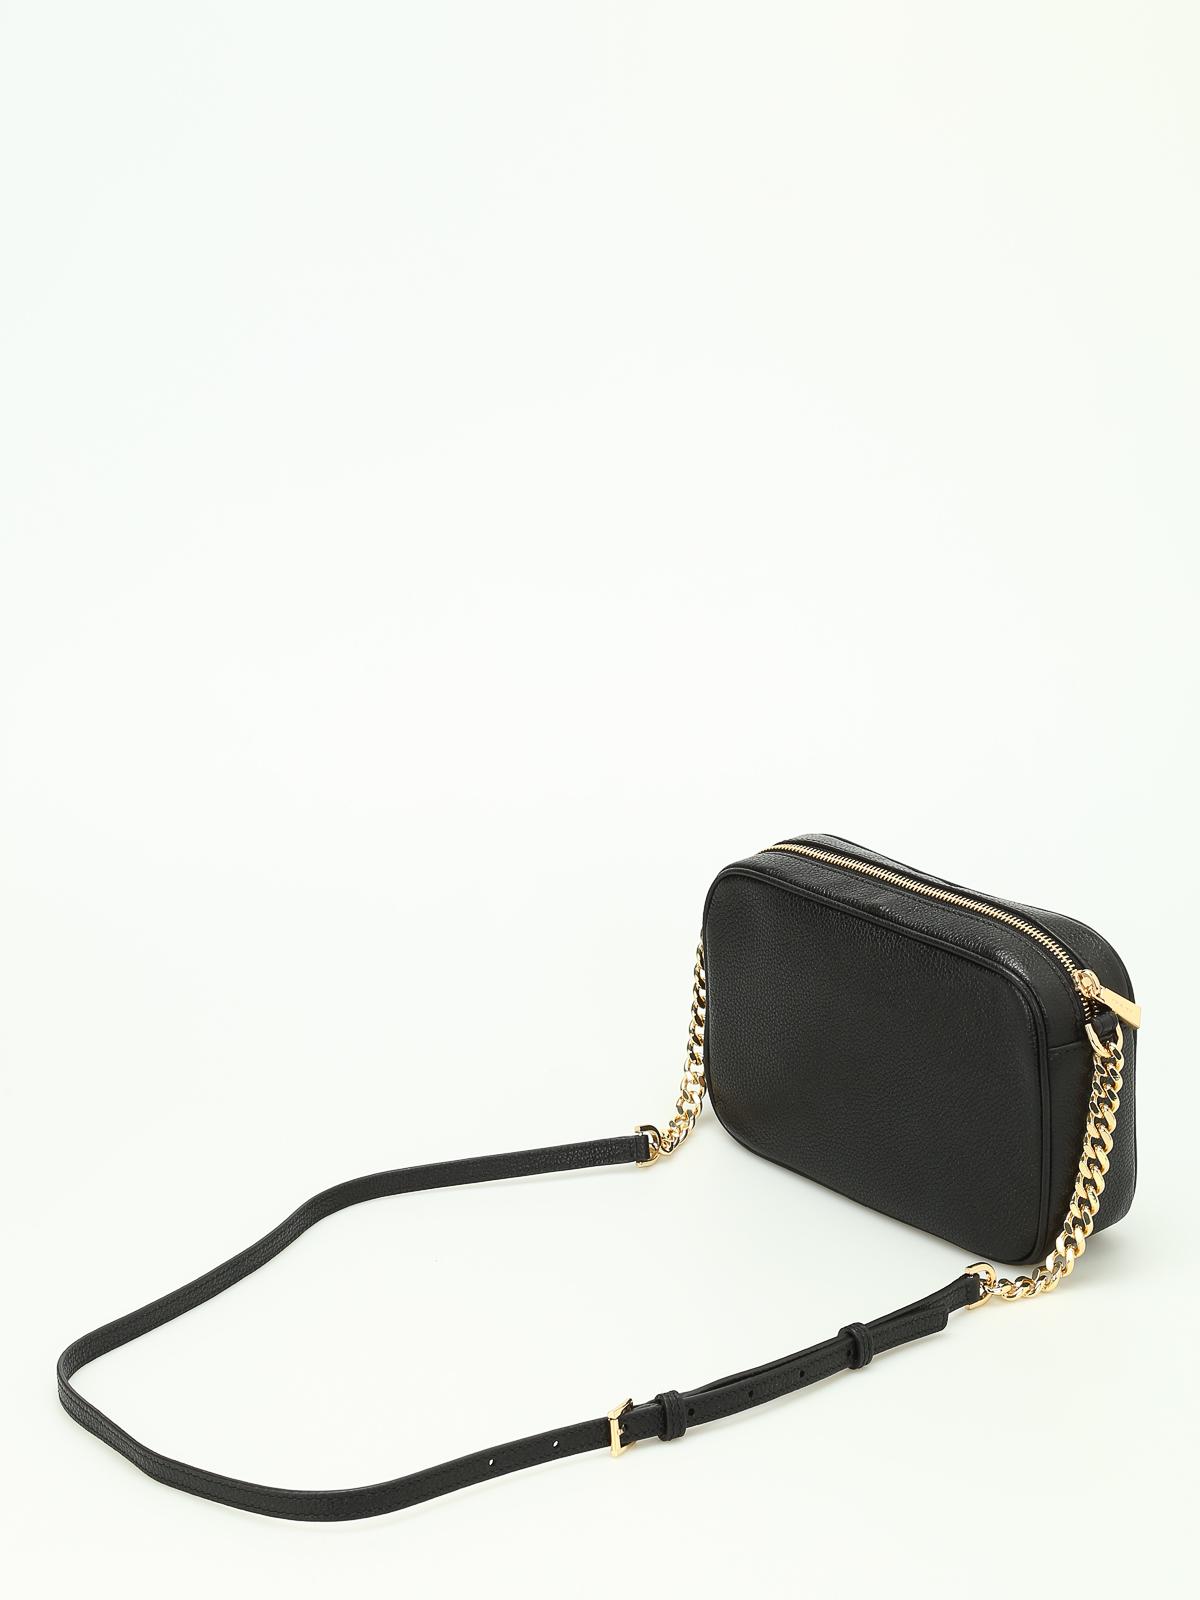 iKRIX MICHAEL KORS  cross body bags - Ginny leather camera bag 23e03e6d35771